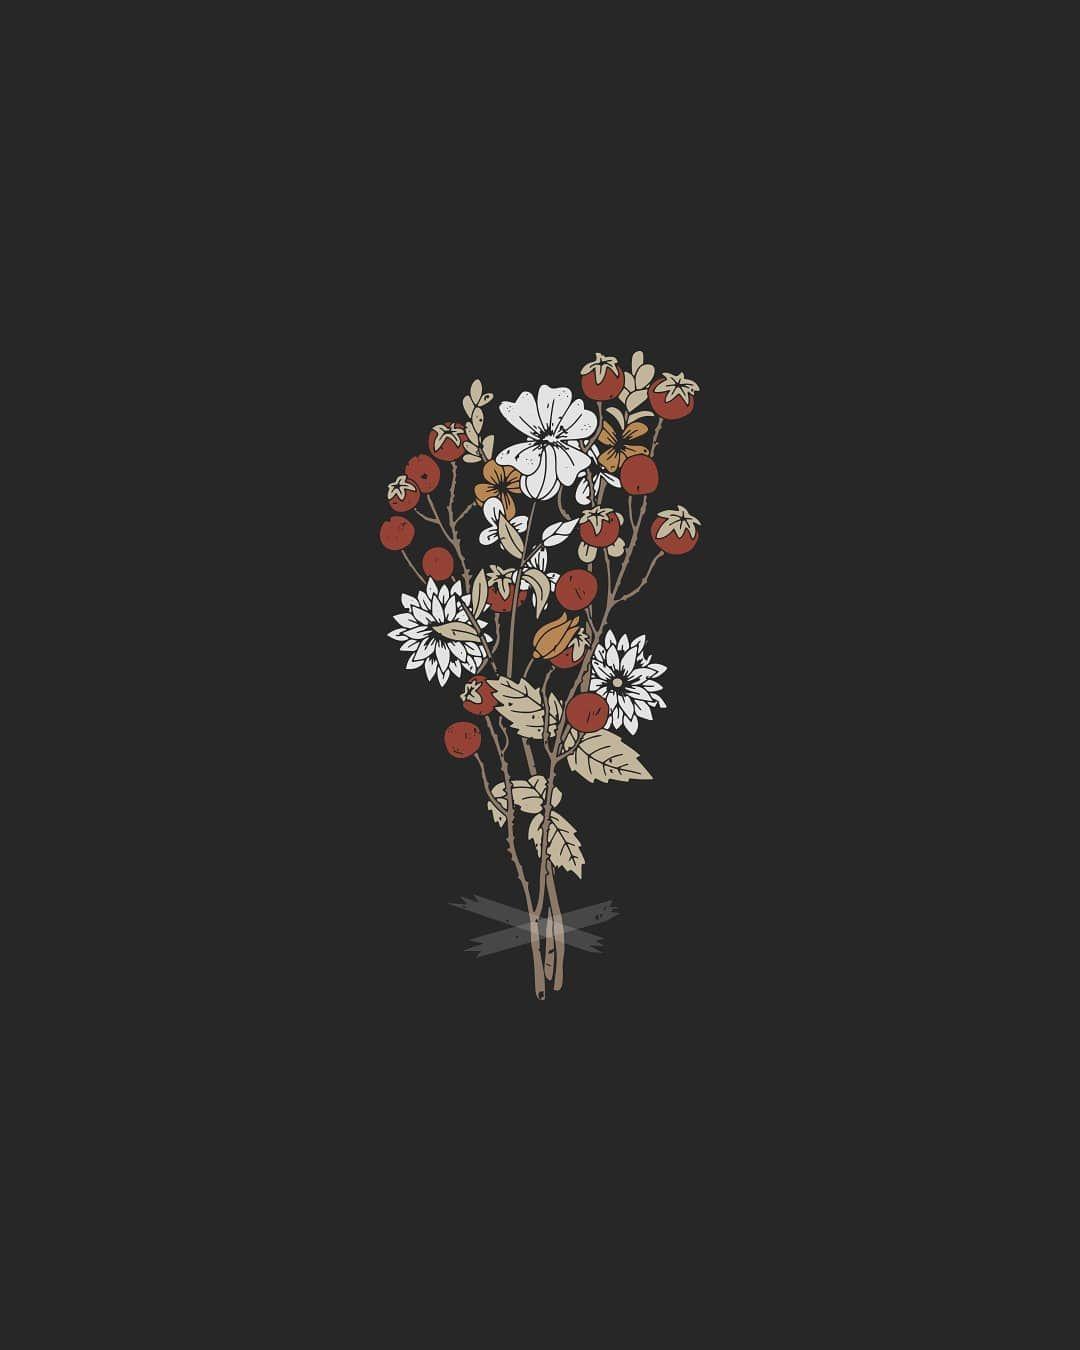 Flowers Grow Out Of Dark Moments Love Doodle Weedingday Instaart Flowerstagram Vintagefashion Hipster Phone Wallpaper Minimalist Wallpaper Dark Flowers